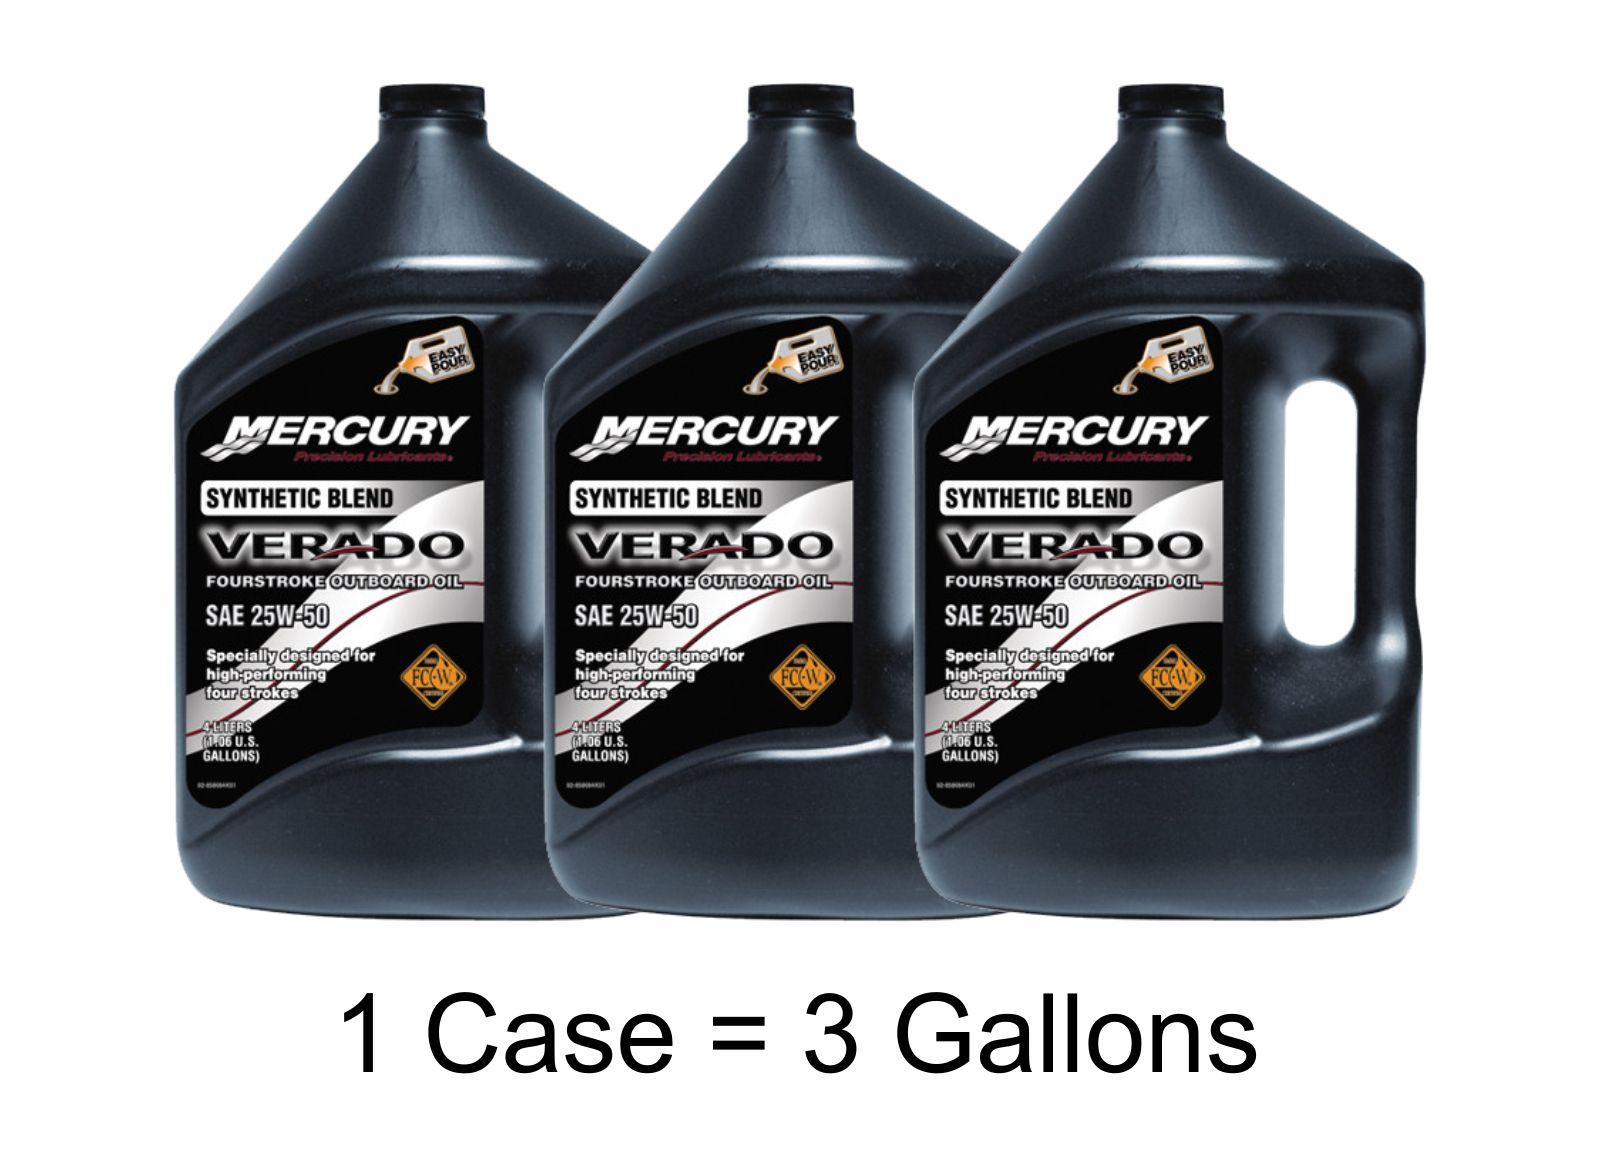 Mercury Verado Synthetic Blend Oil Case Of 3 Gallons